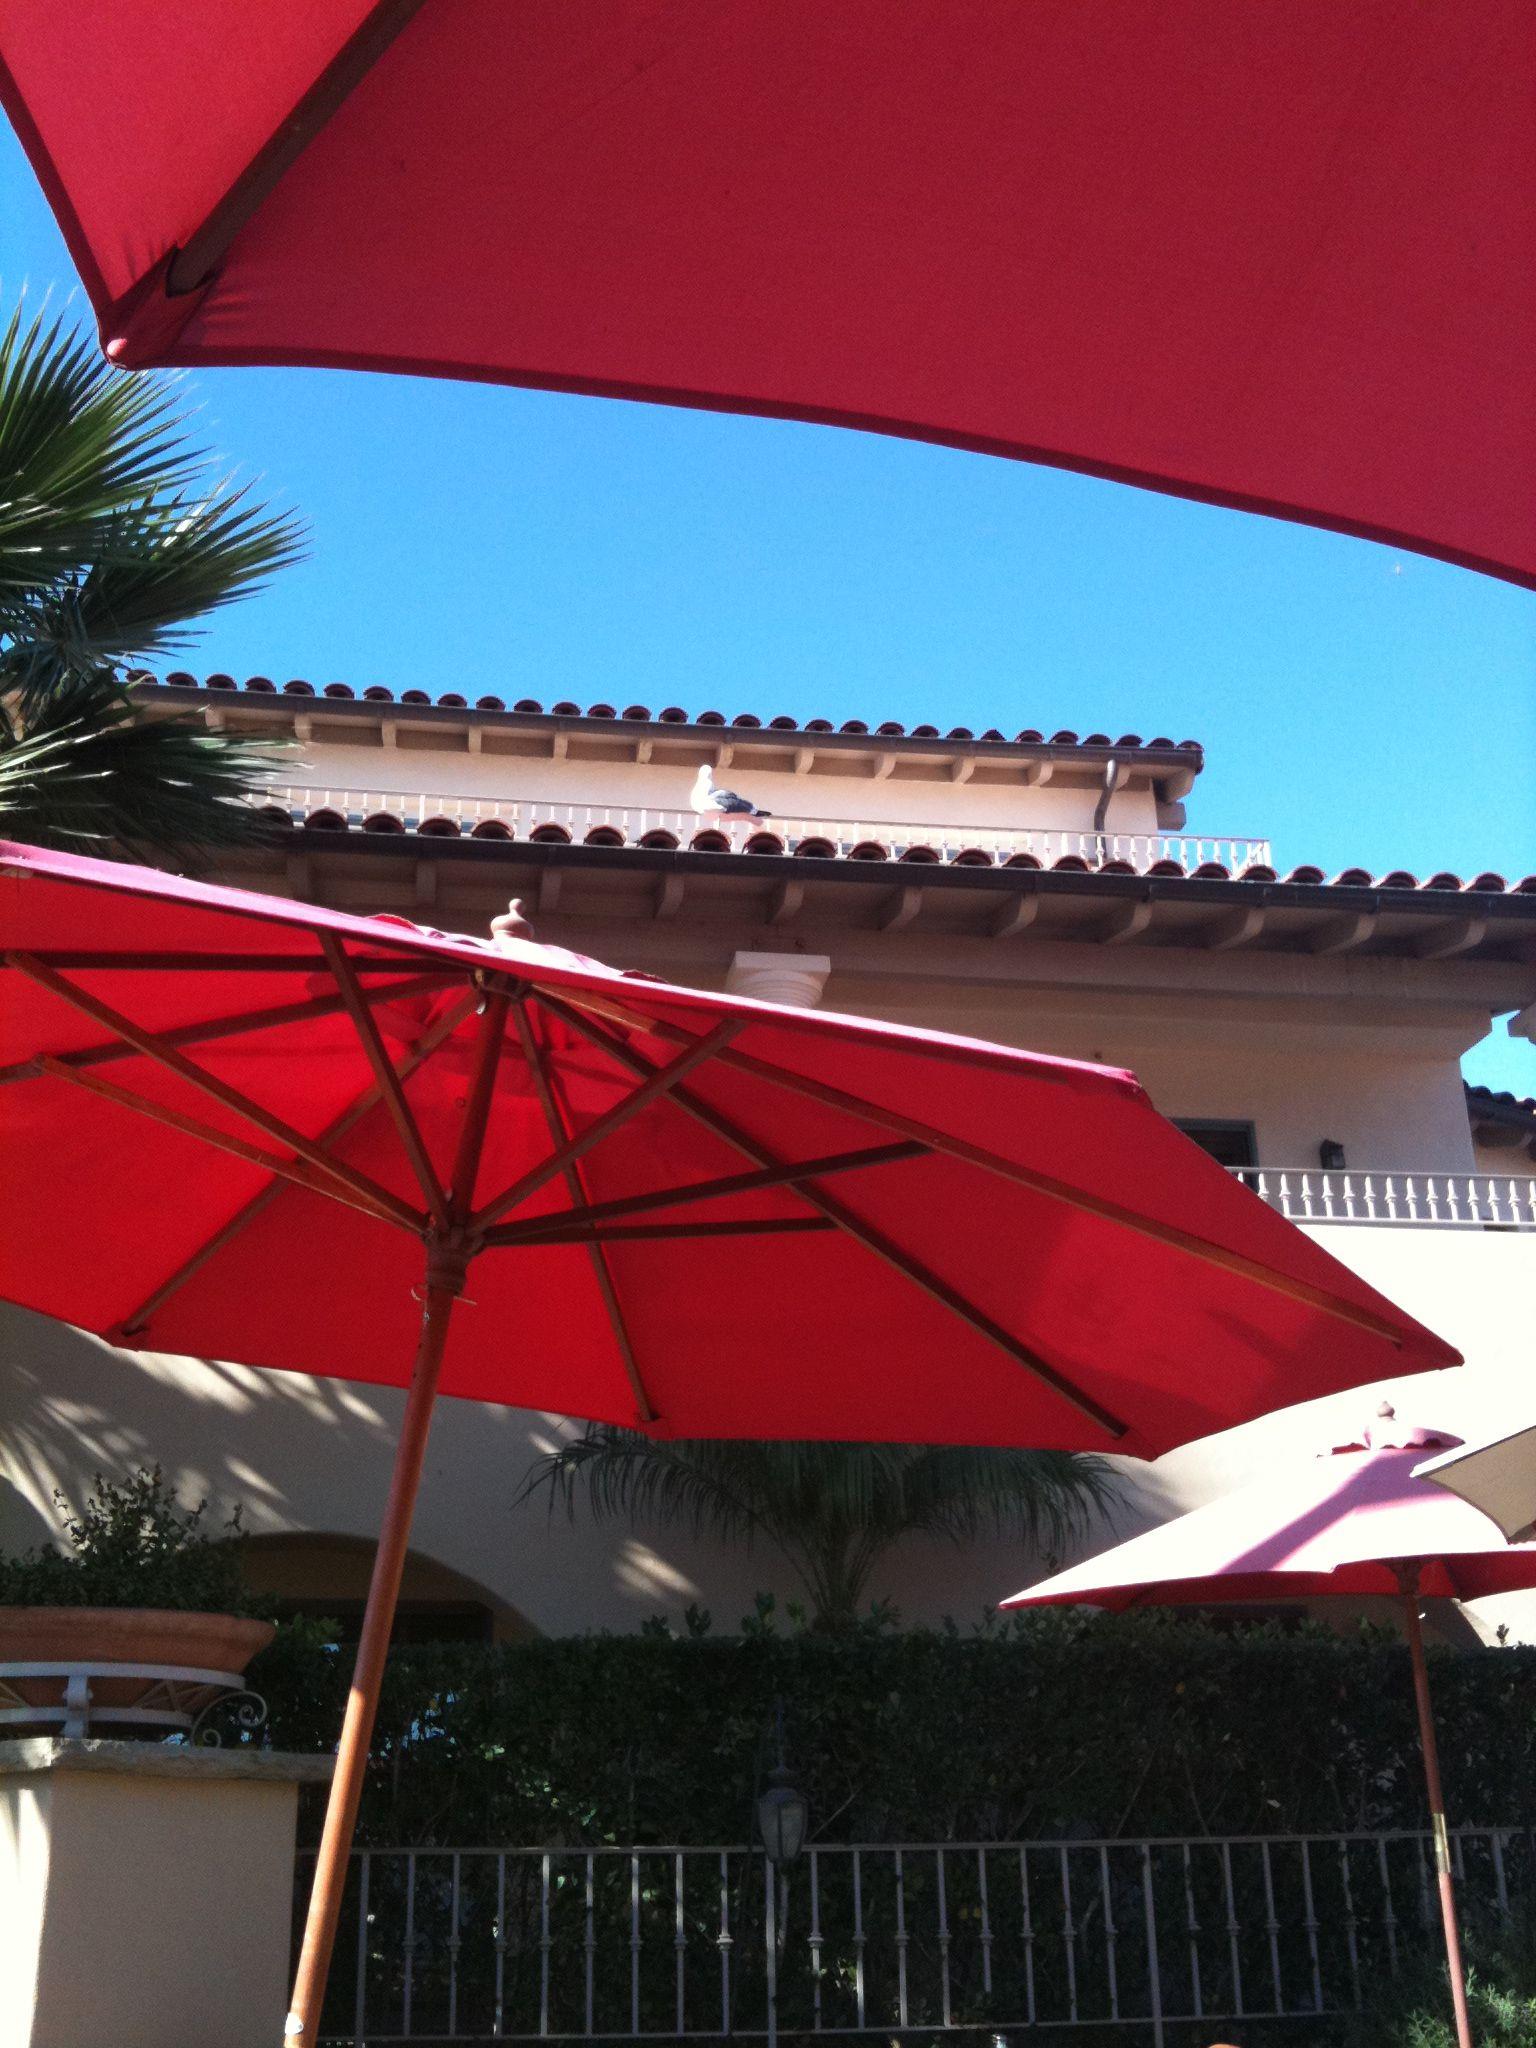 Dinner at Eladio's, Santa Barbara